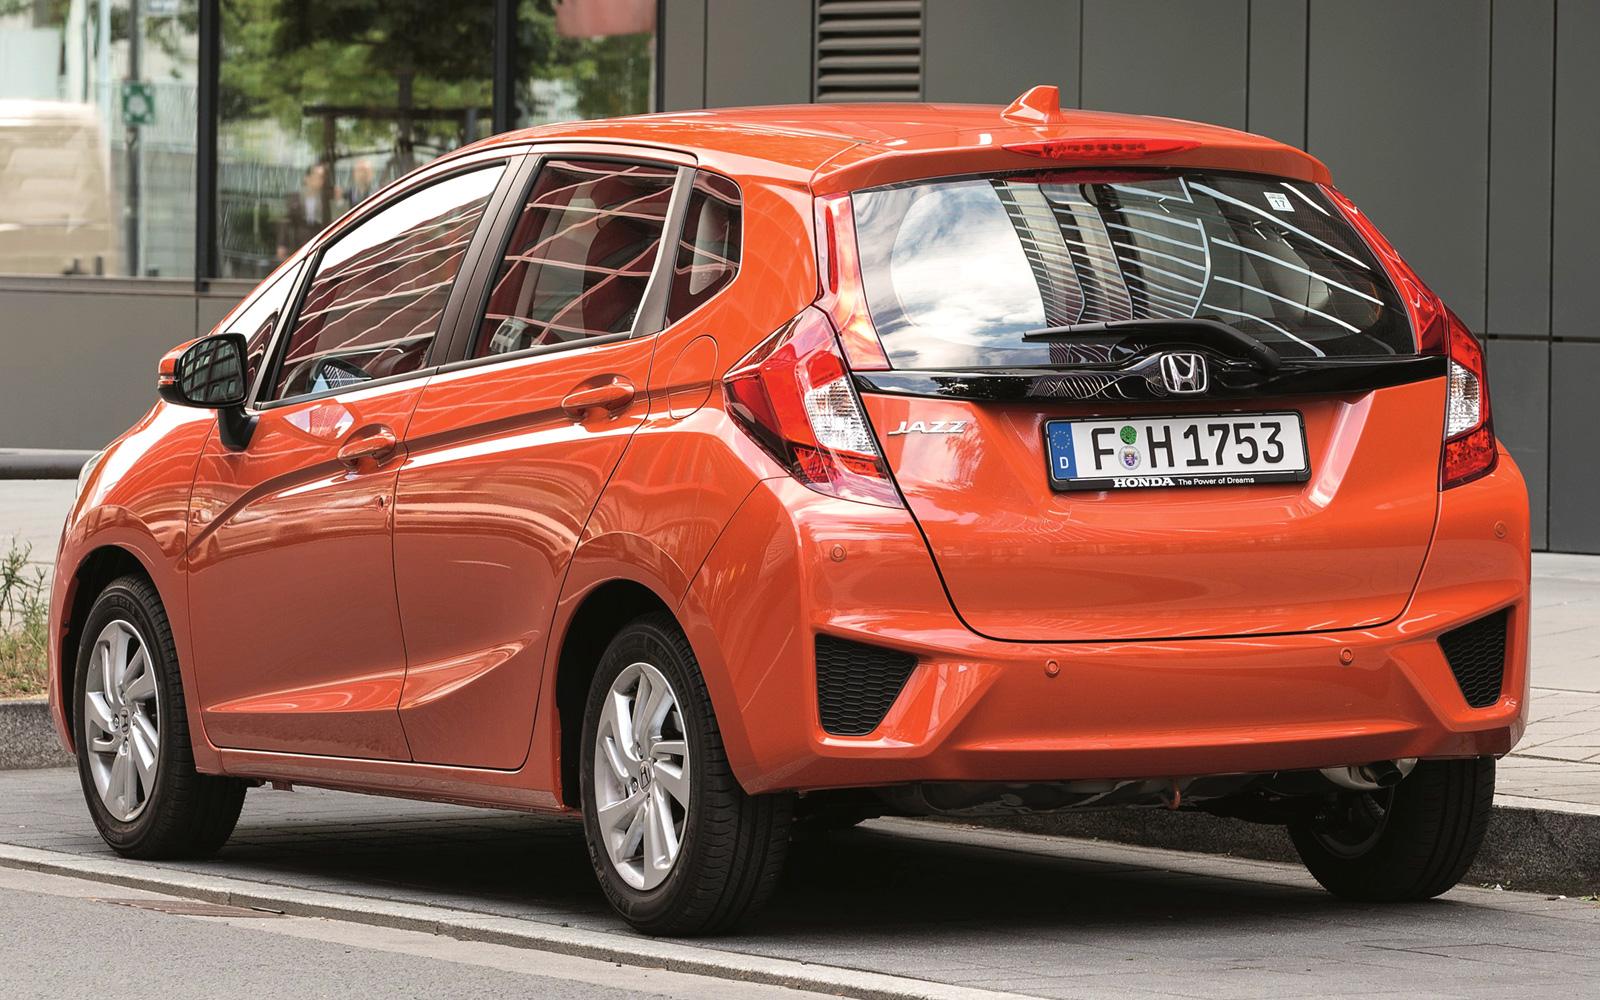 Honda Jazz 3 2018 2019 цена и характеристики фотографии и обзор